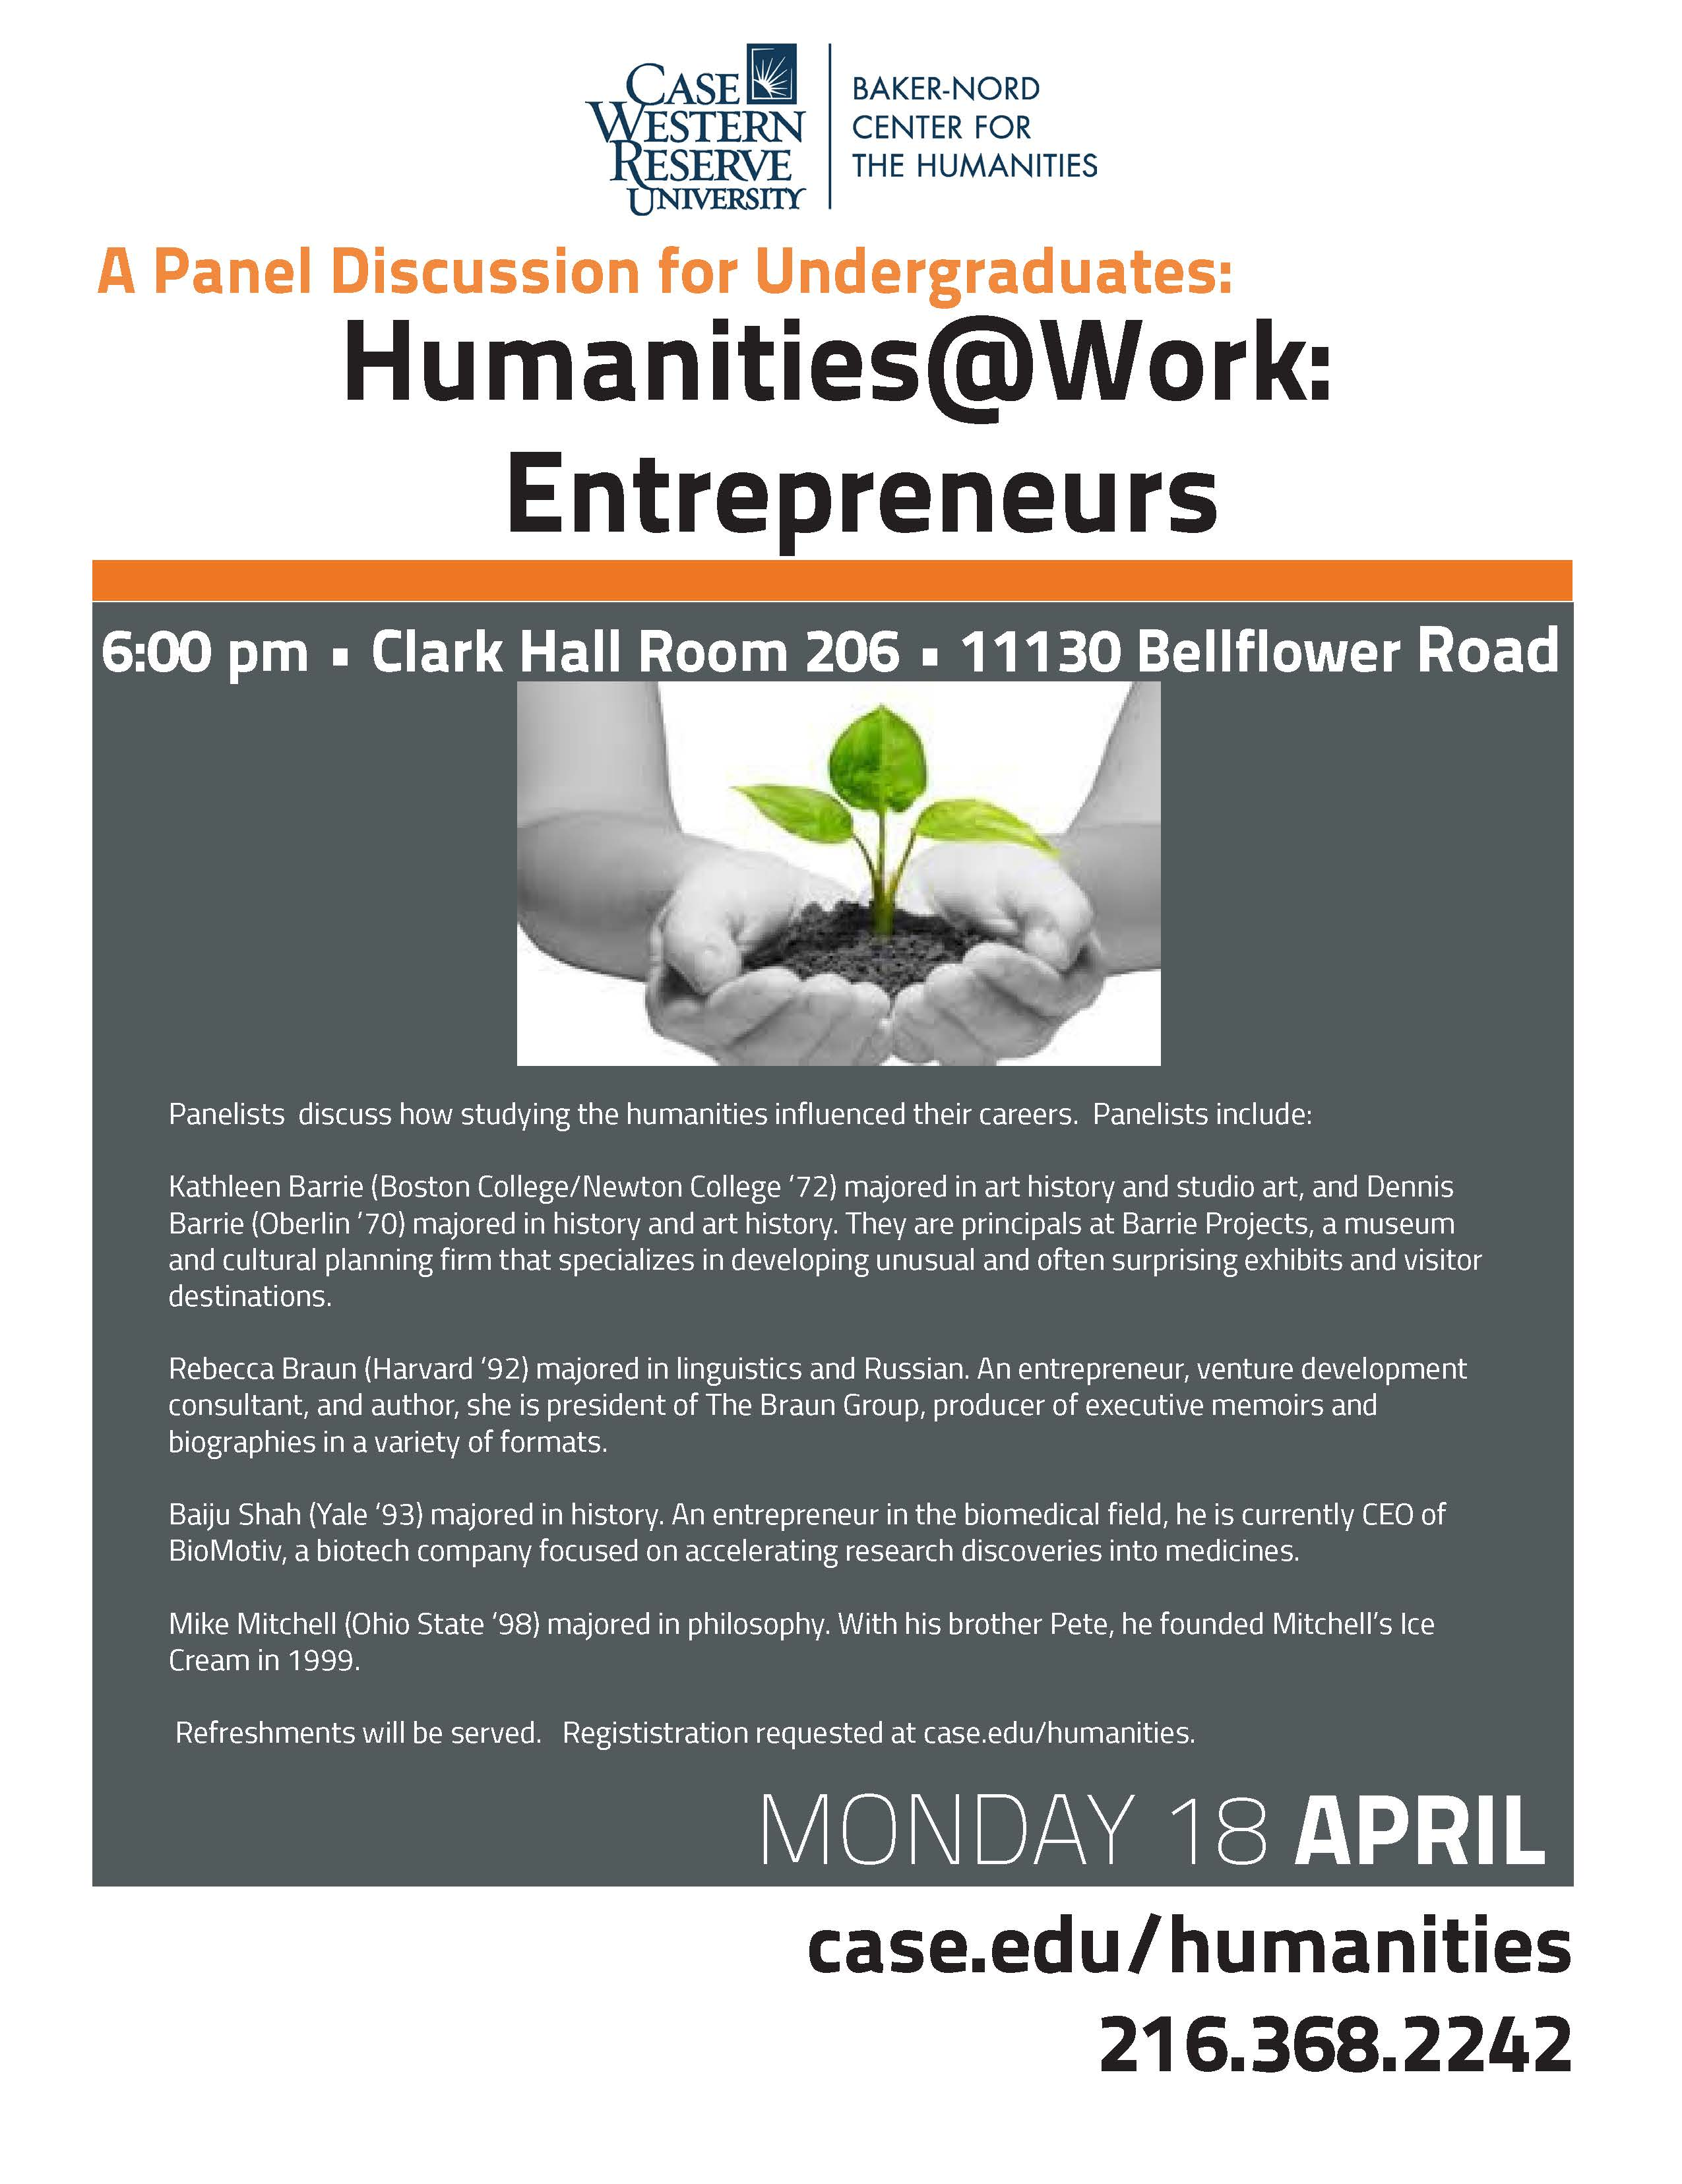 Humanites@Work Entrepreneurs flyer